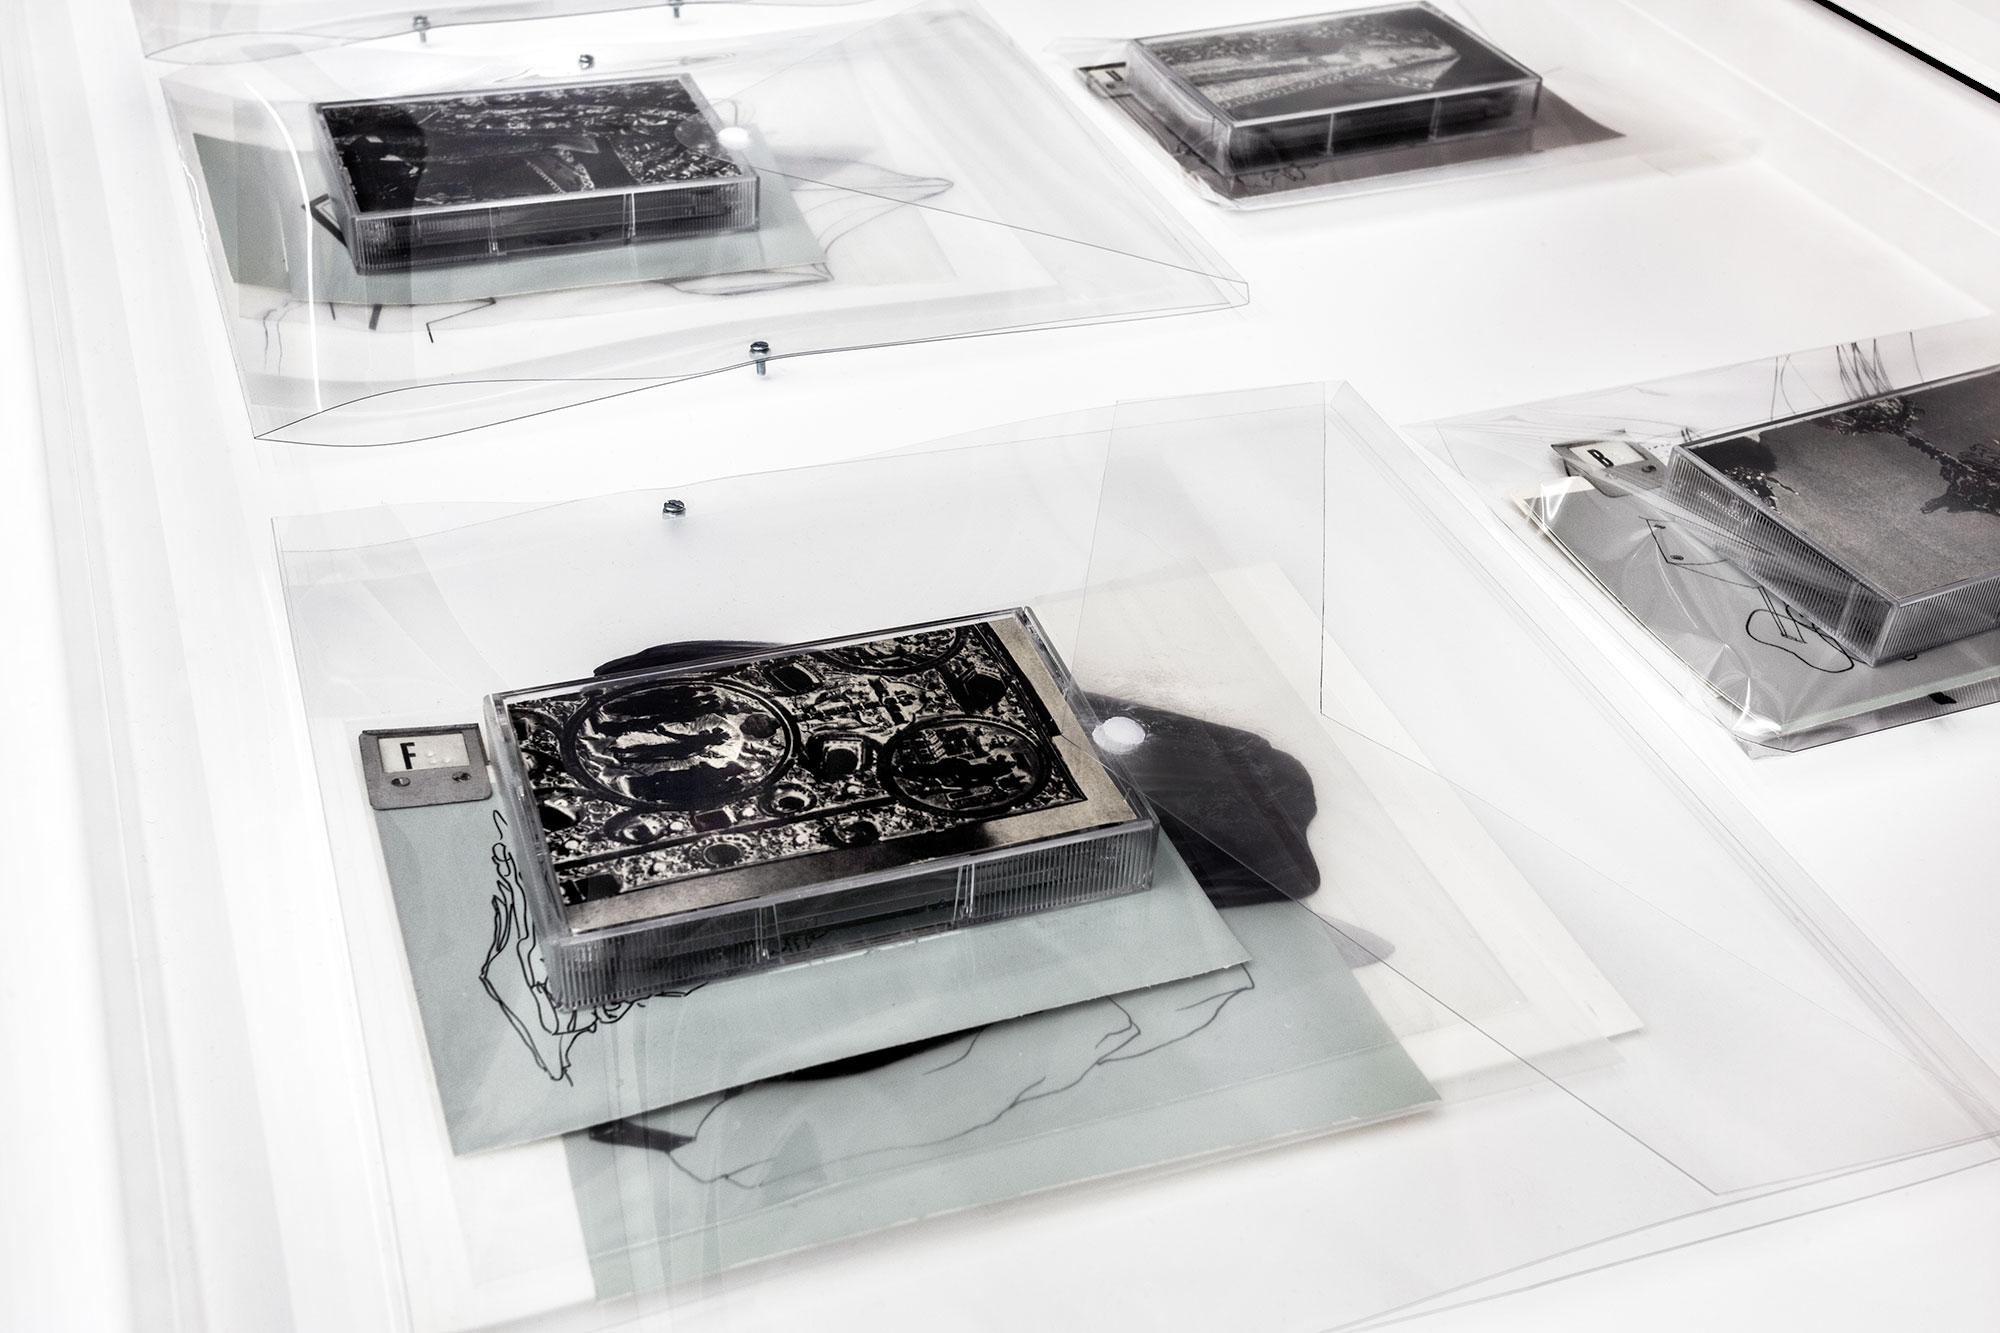 Jacek Doroszenko - Useful Remnants, album detail 12, Kasia Michalski Gallery